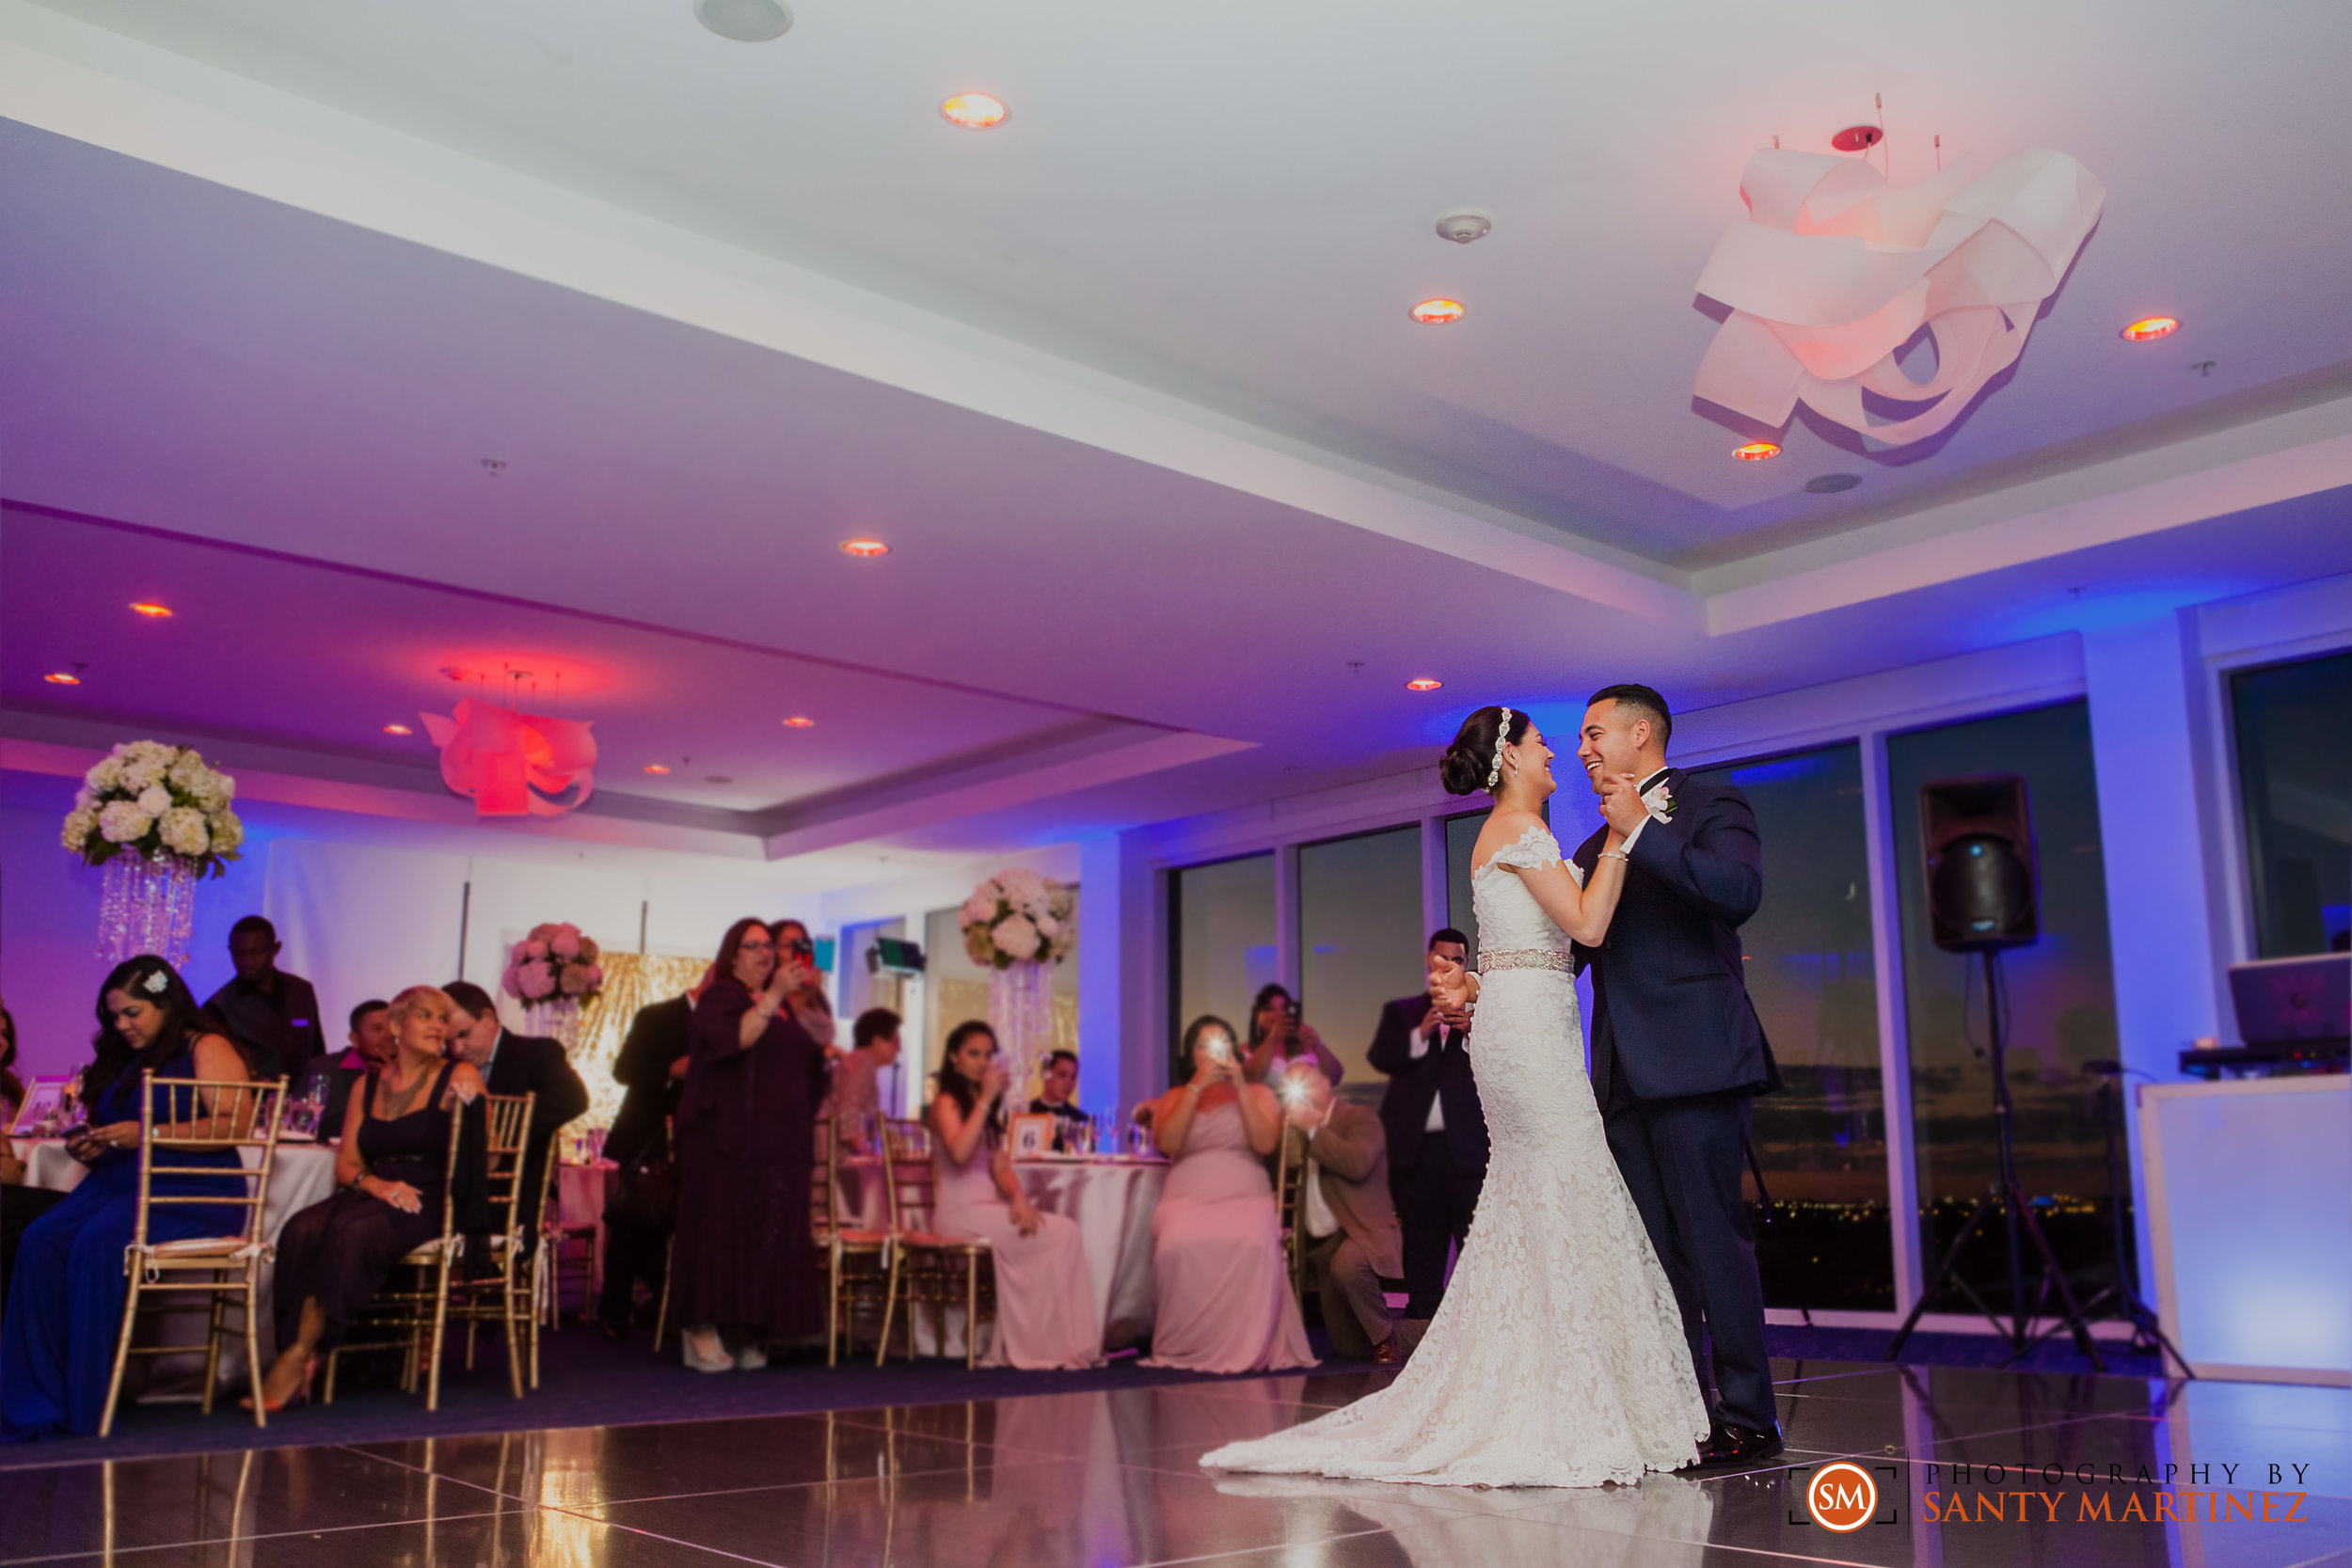 Miami Wedding Photographer - Santy Martinez-32.jpg